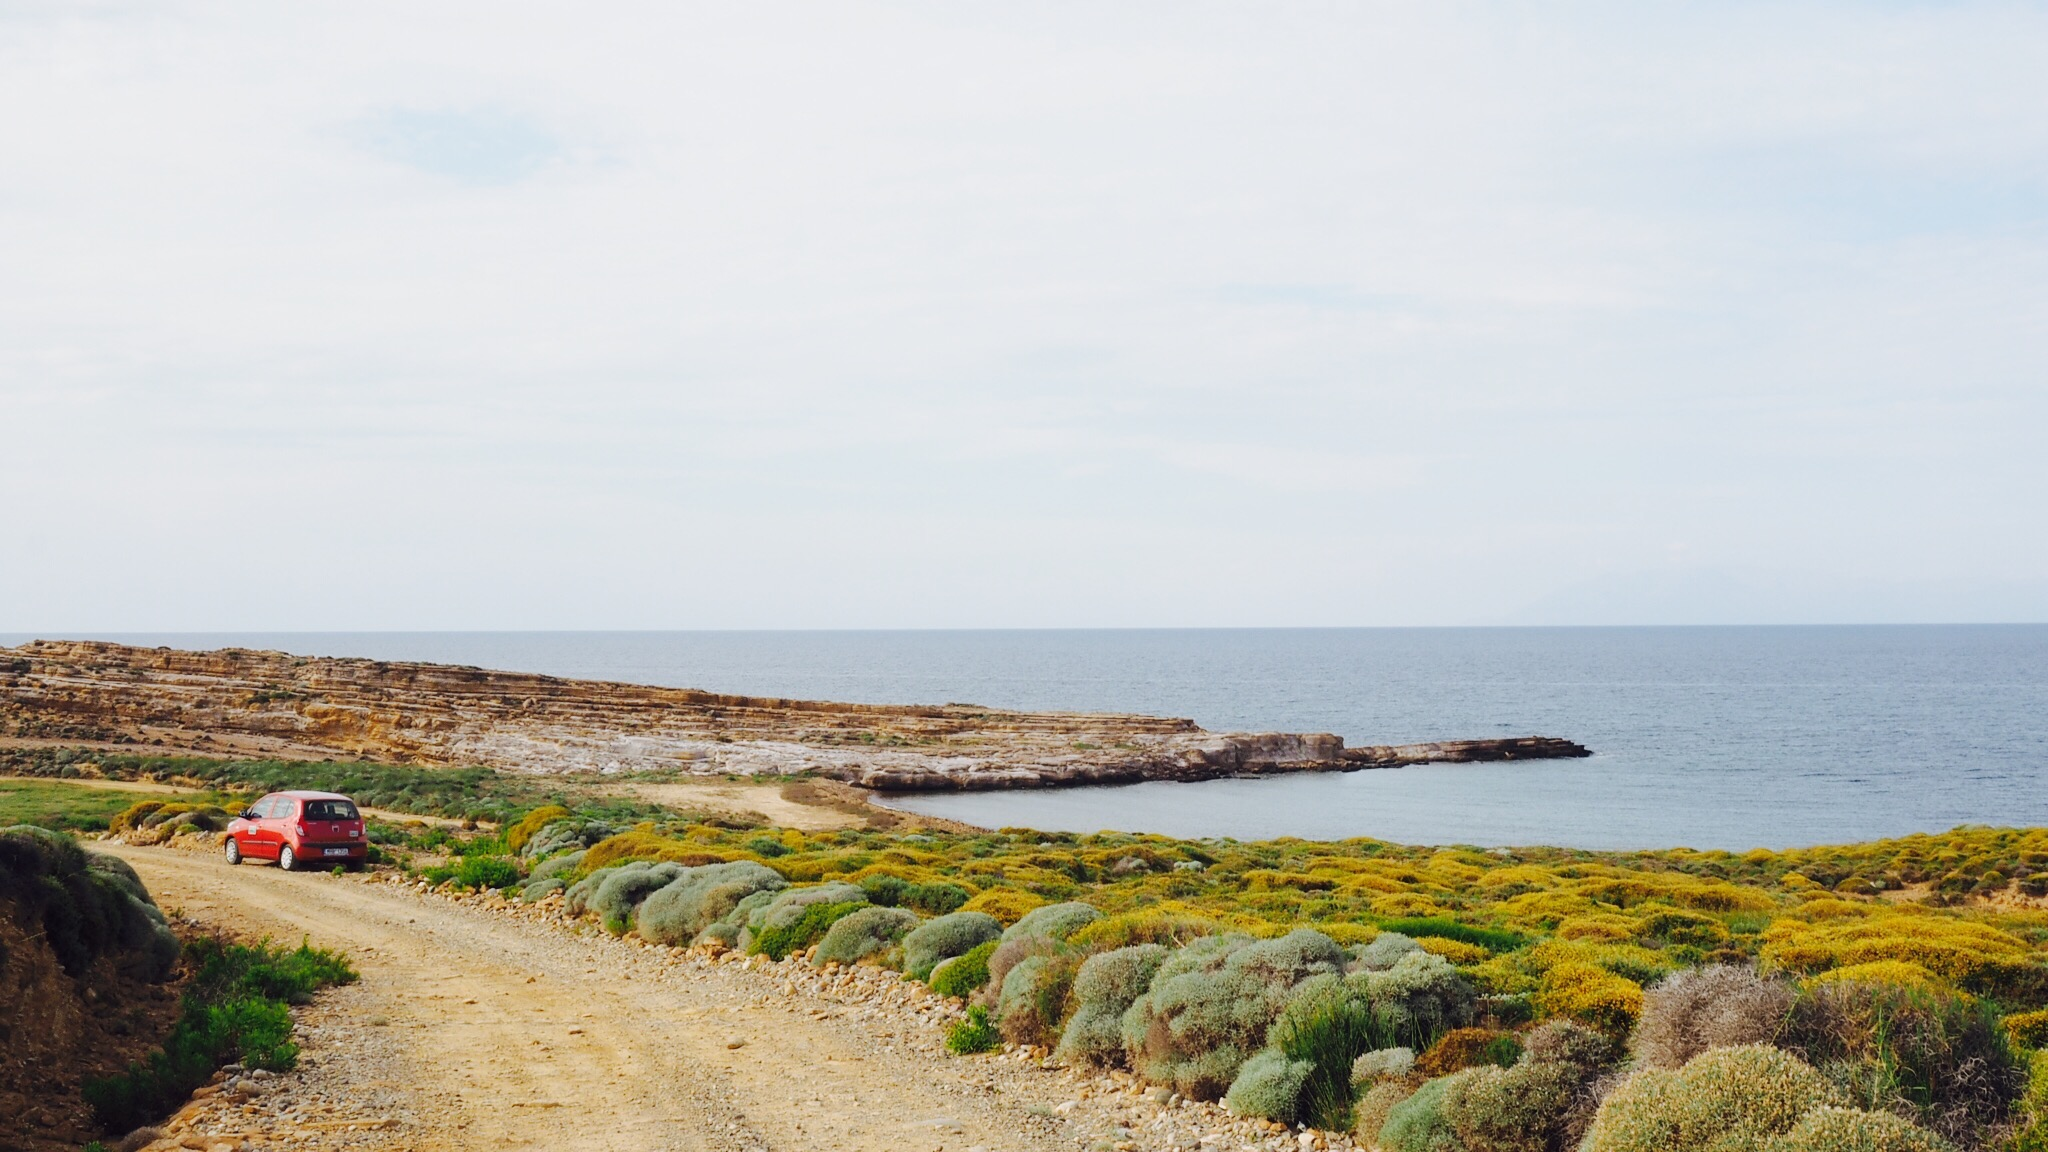 Frakolo Cape - surf spot, plus strange rock formation combo